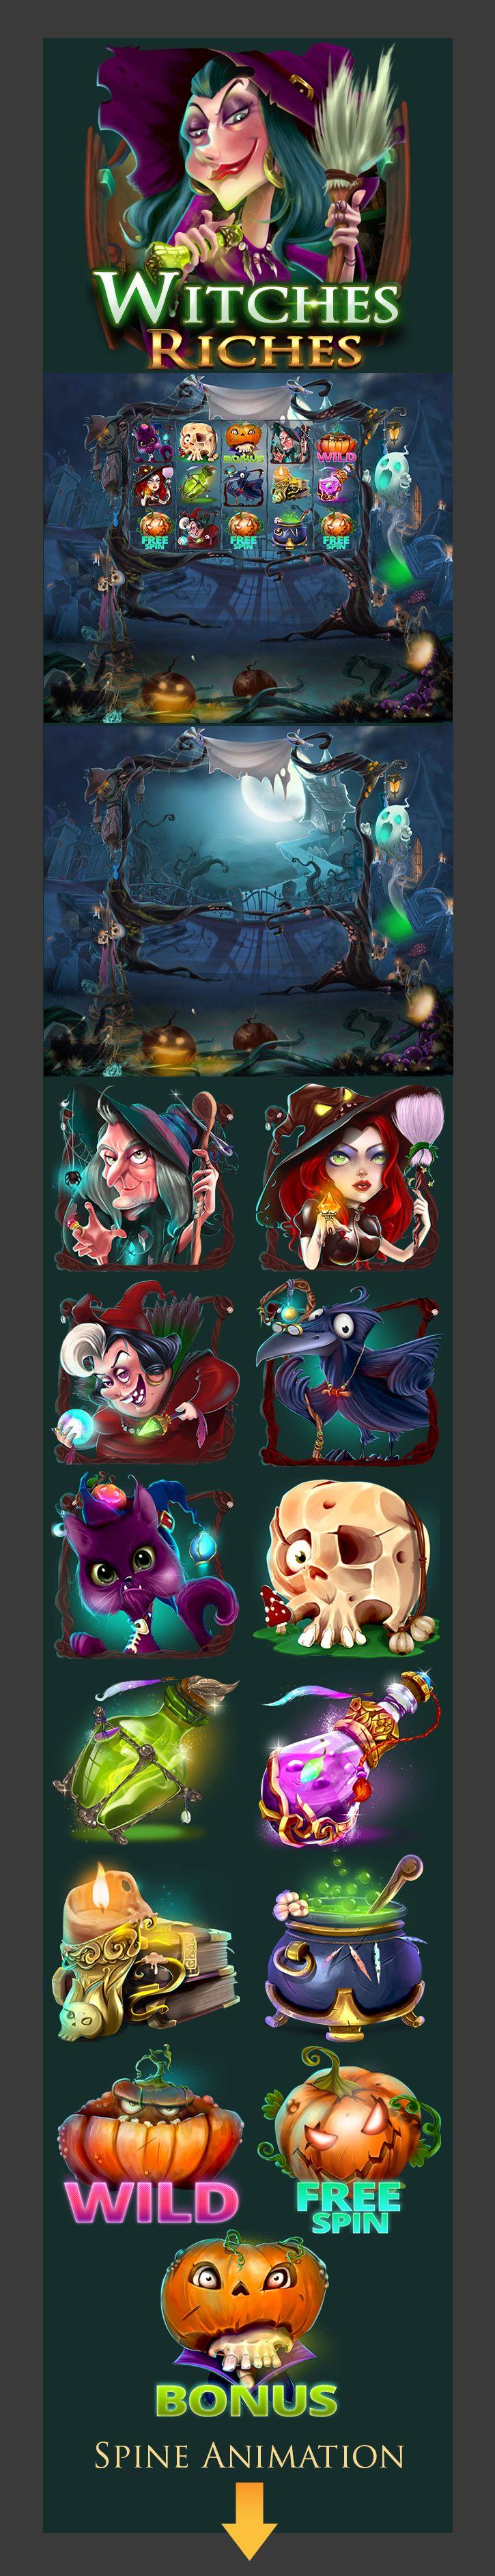 online casino rich witch